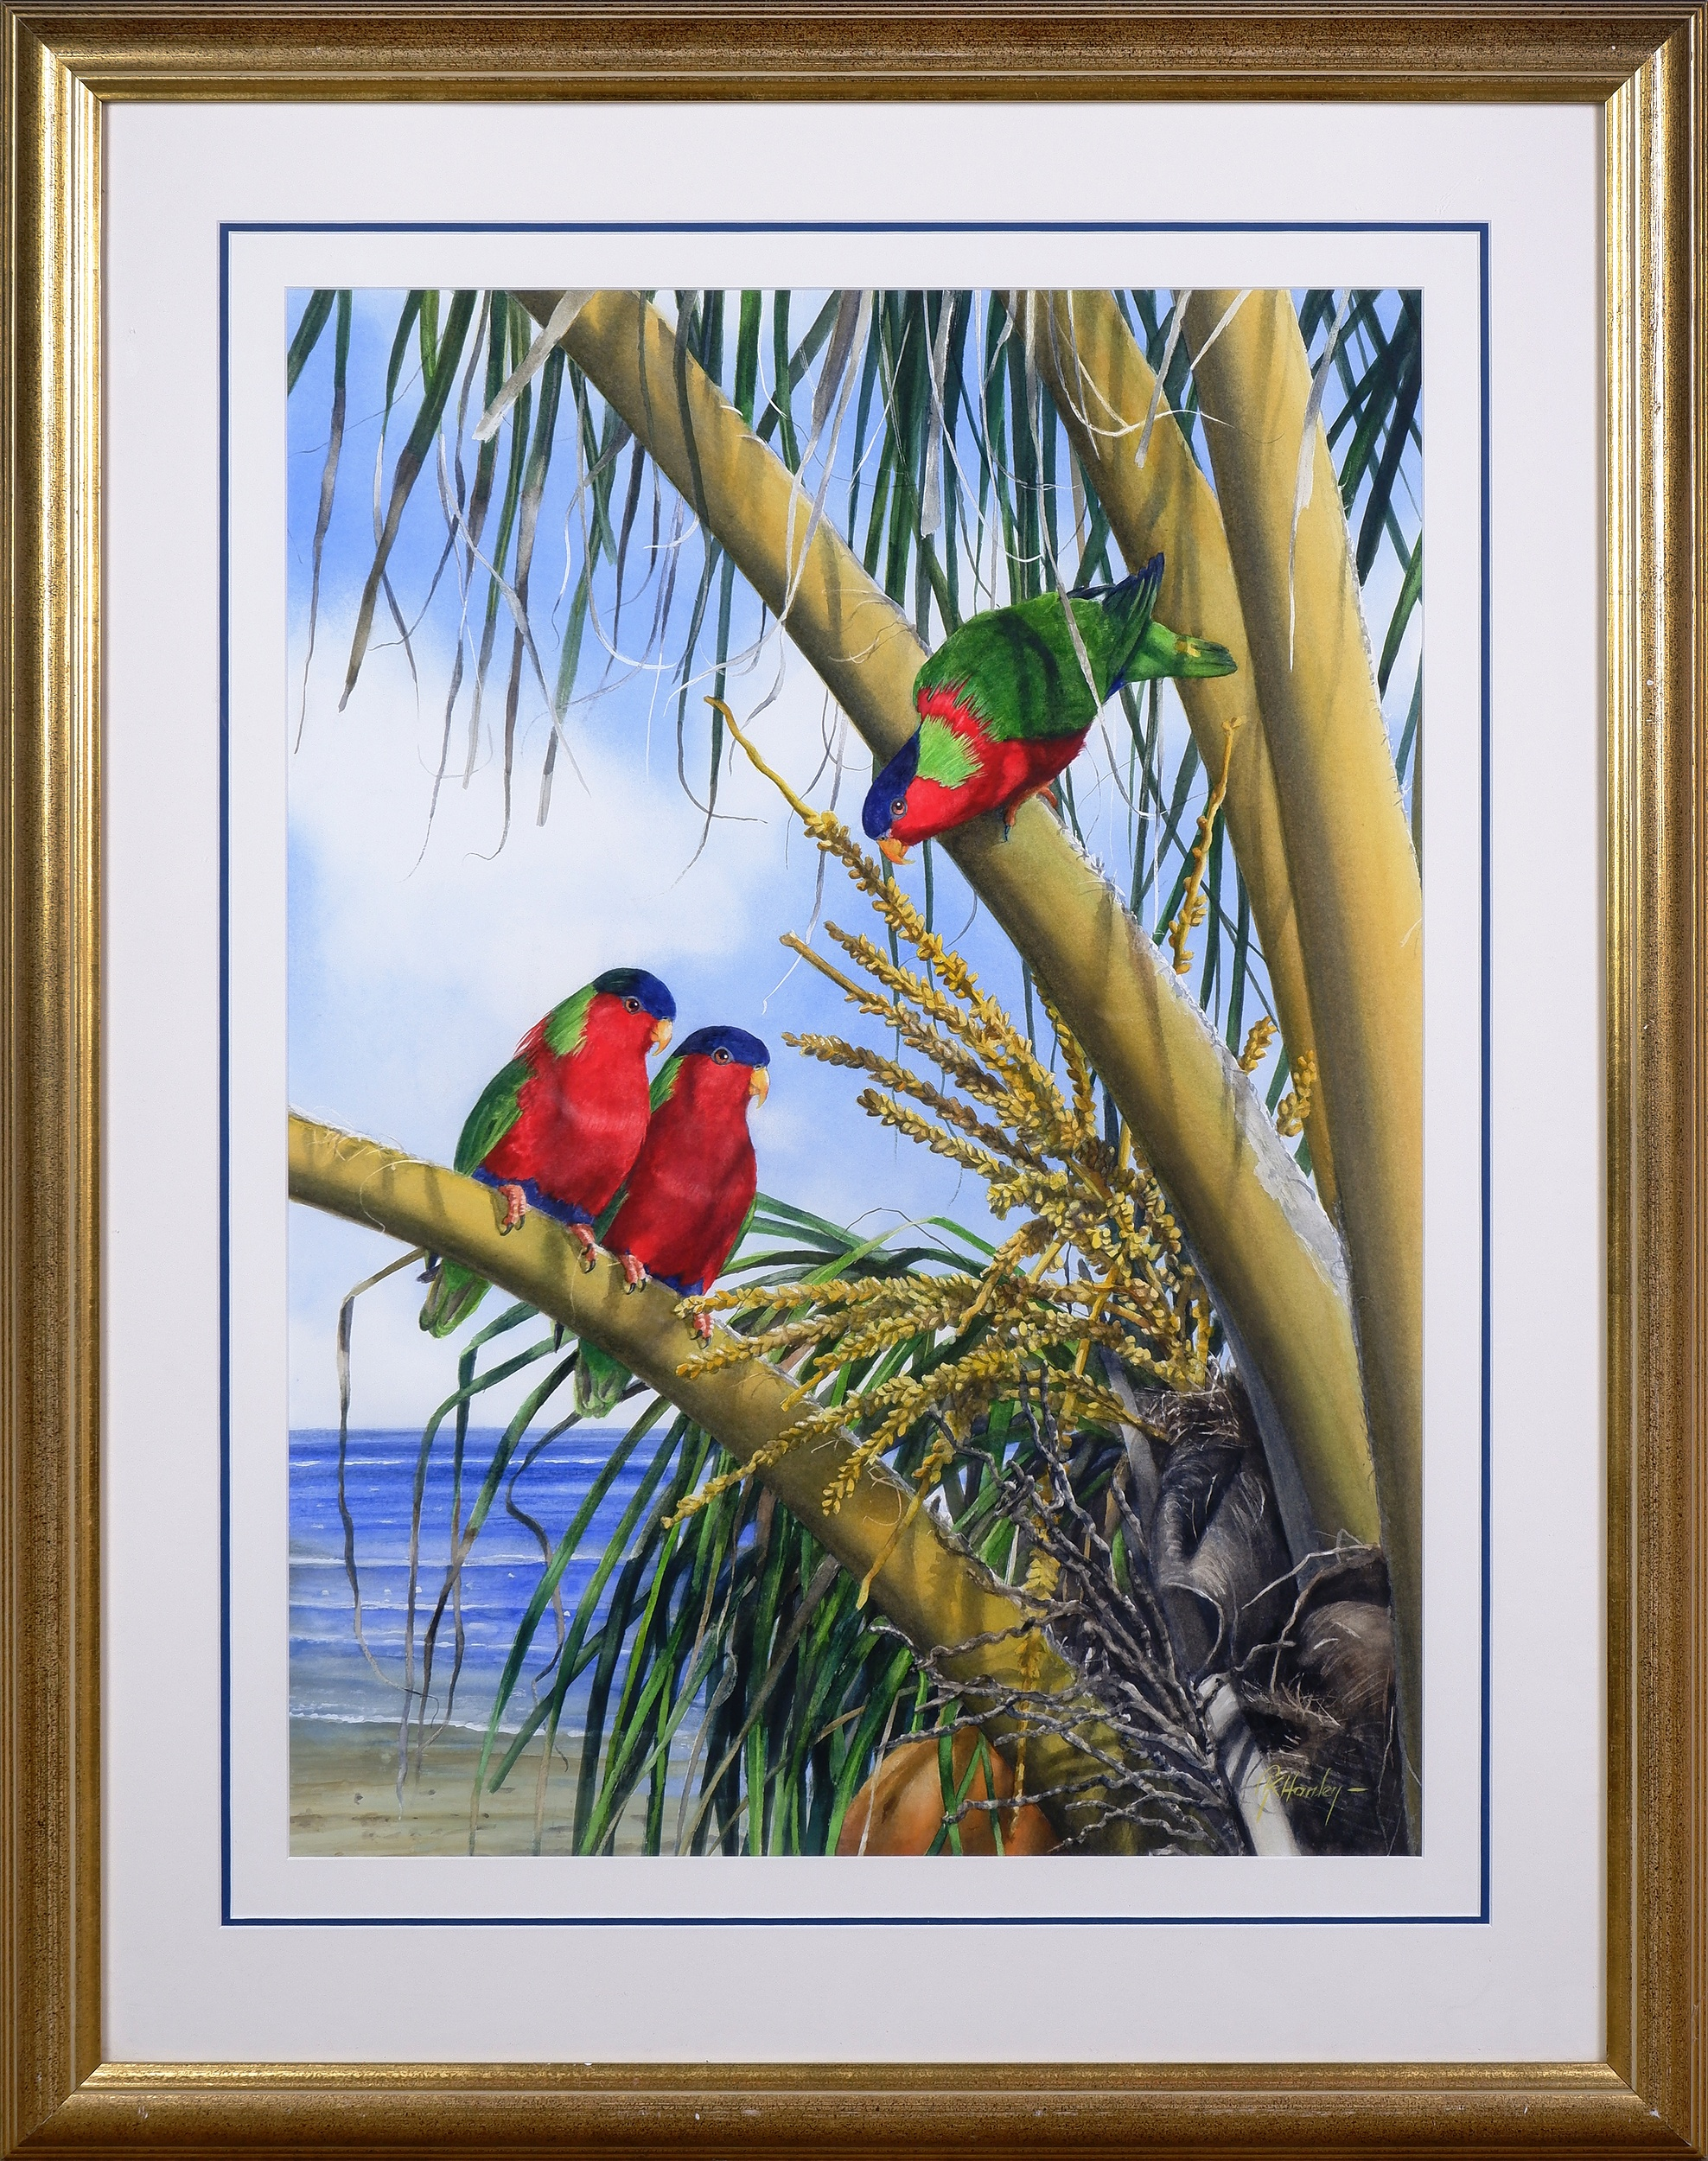 'Gordon Hanley (born 1954), Collared Lory, Watercolour'